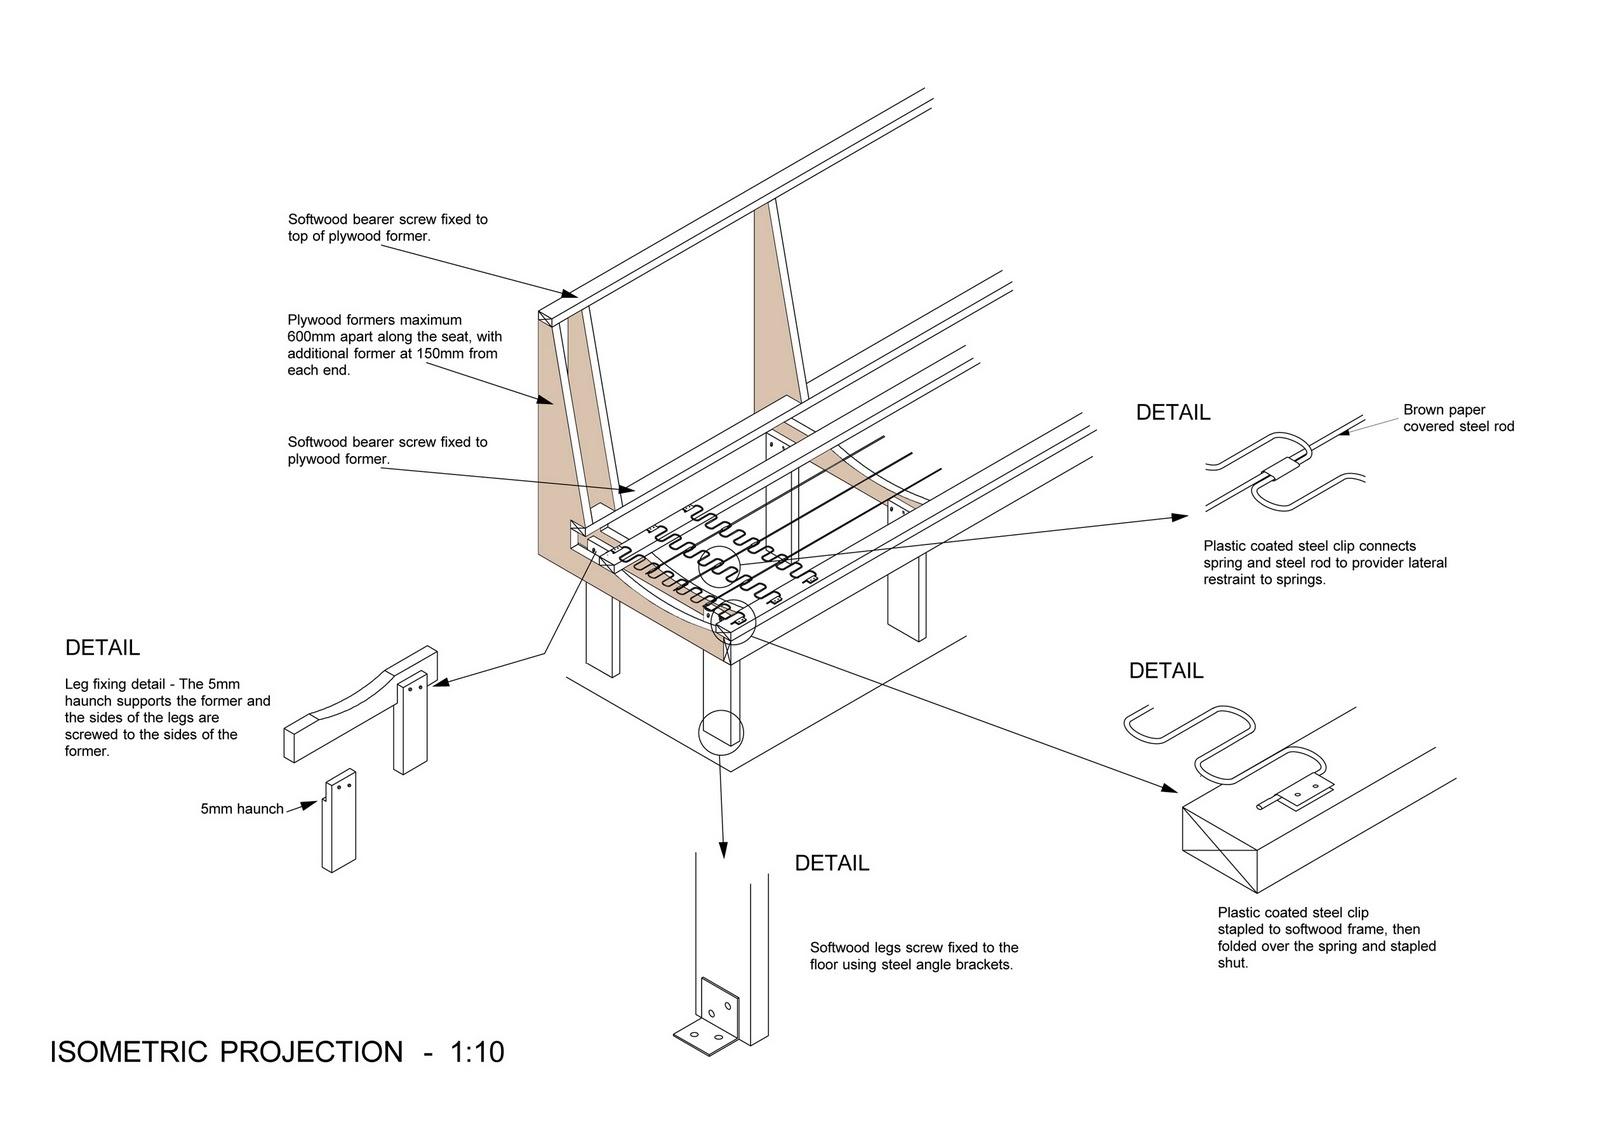 black square pub table and chairs portable rocker chair sangeeta goyal - interior designer: portfolio